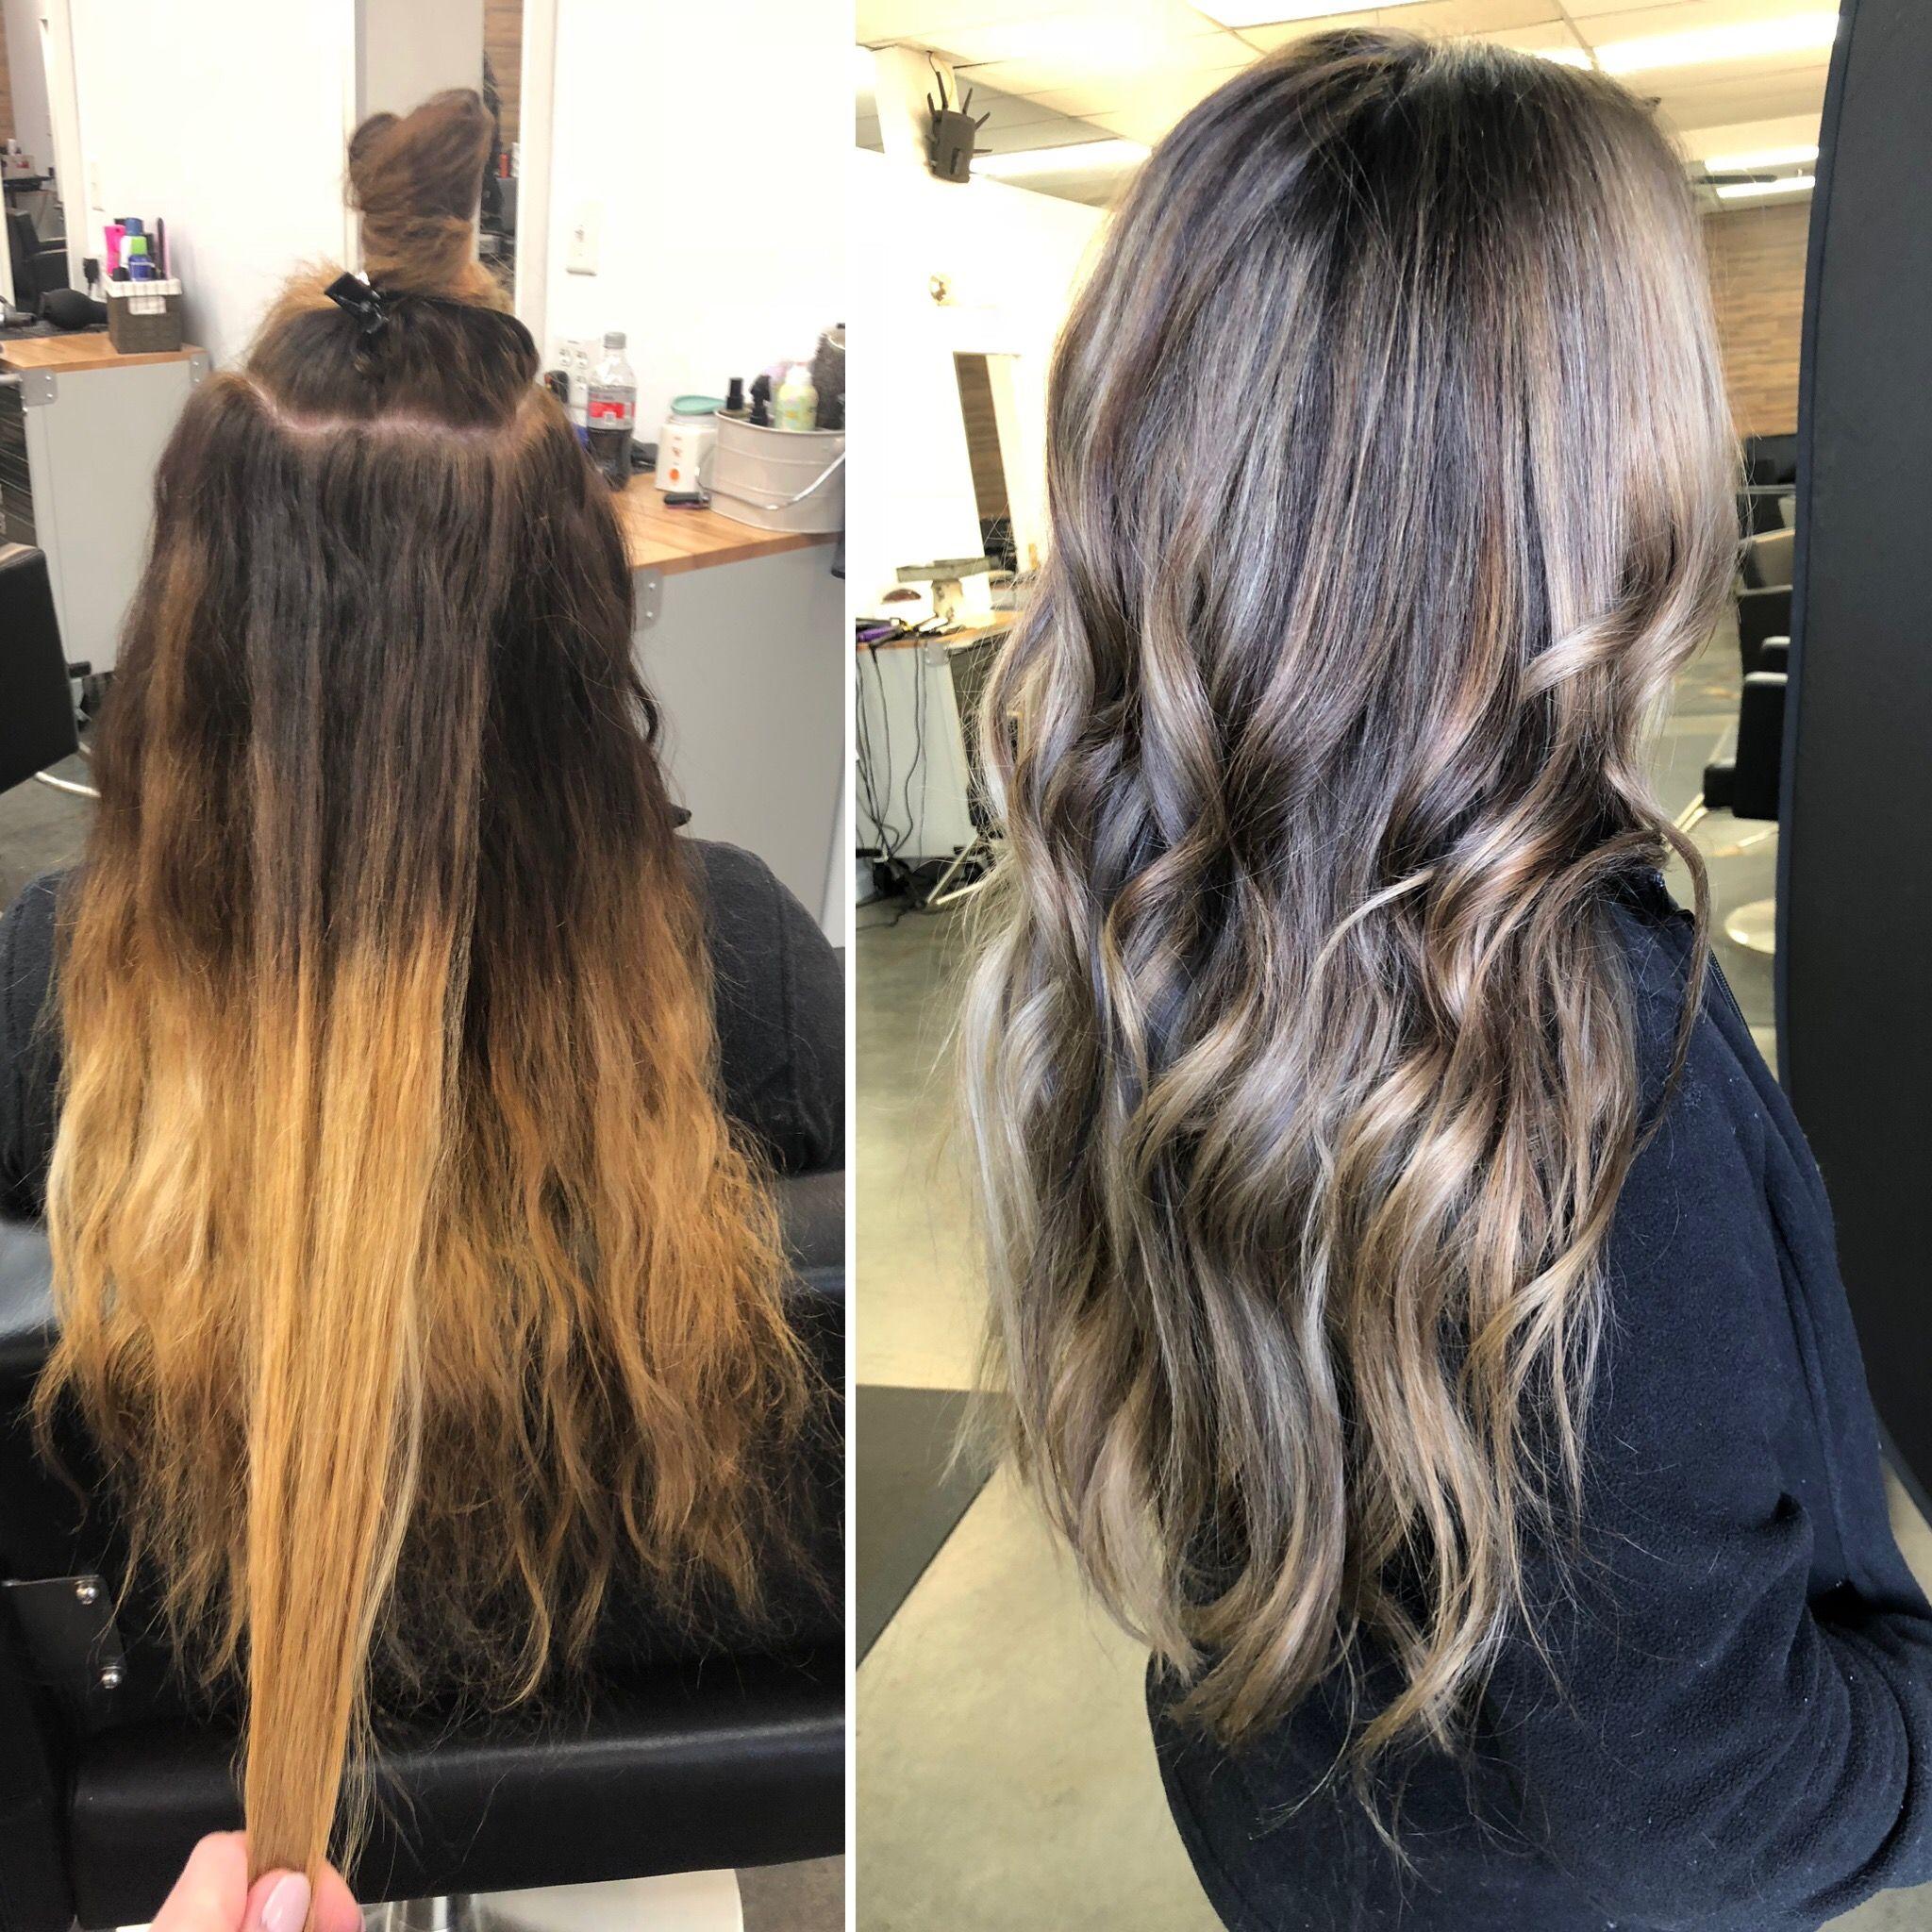 Fix Bad Bayalage Color Correcting The Hard Bayalage Lines Hair Styles Long Hair Styles Hair